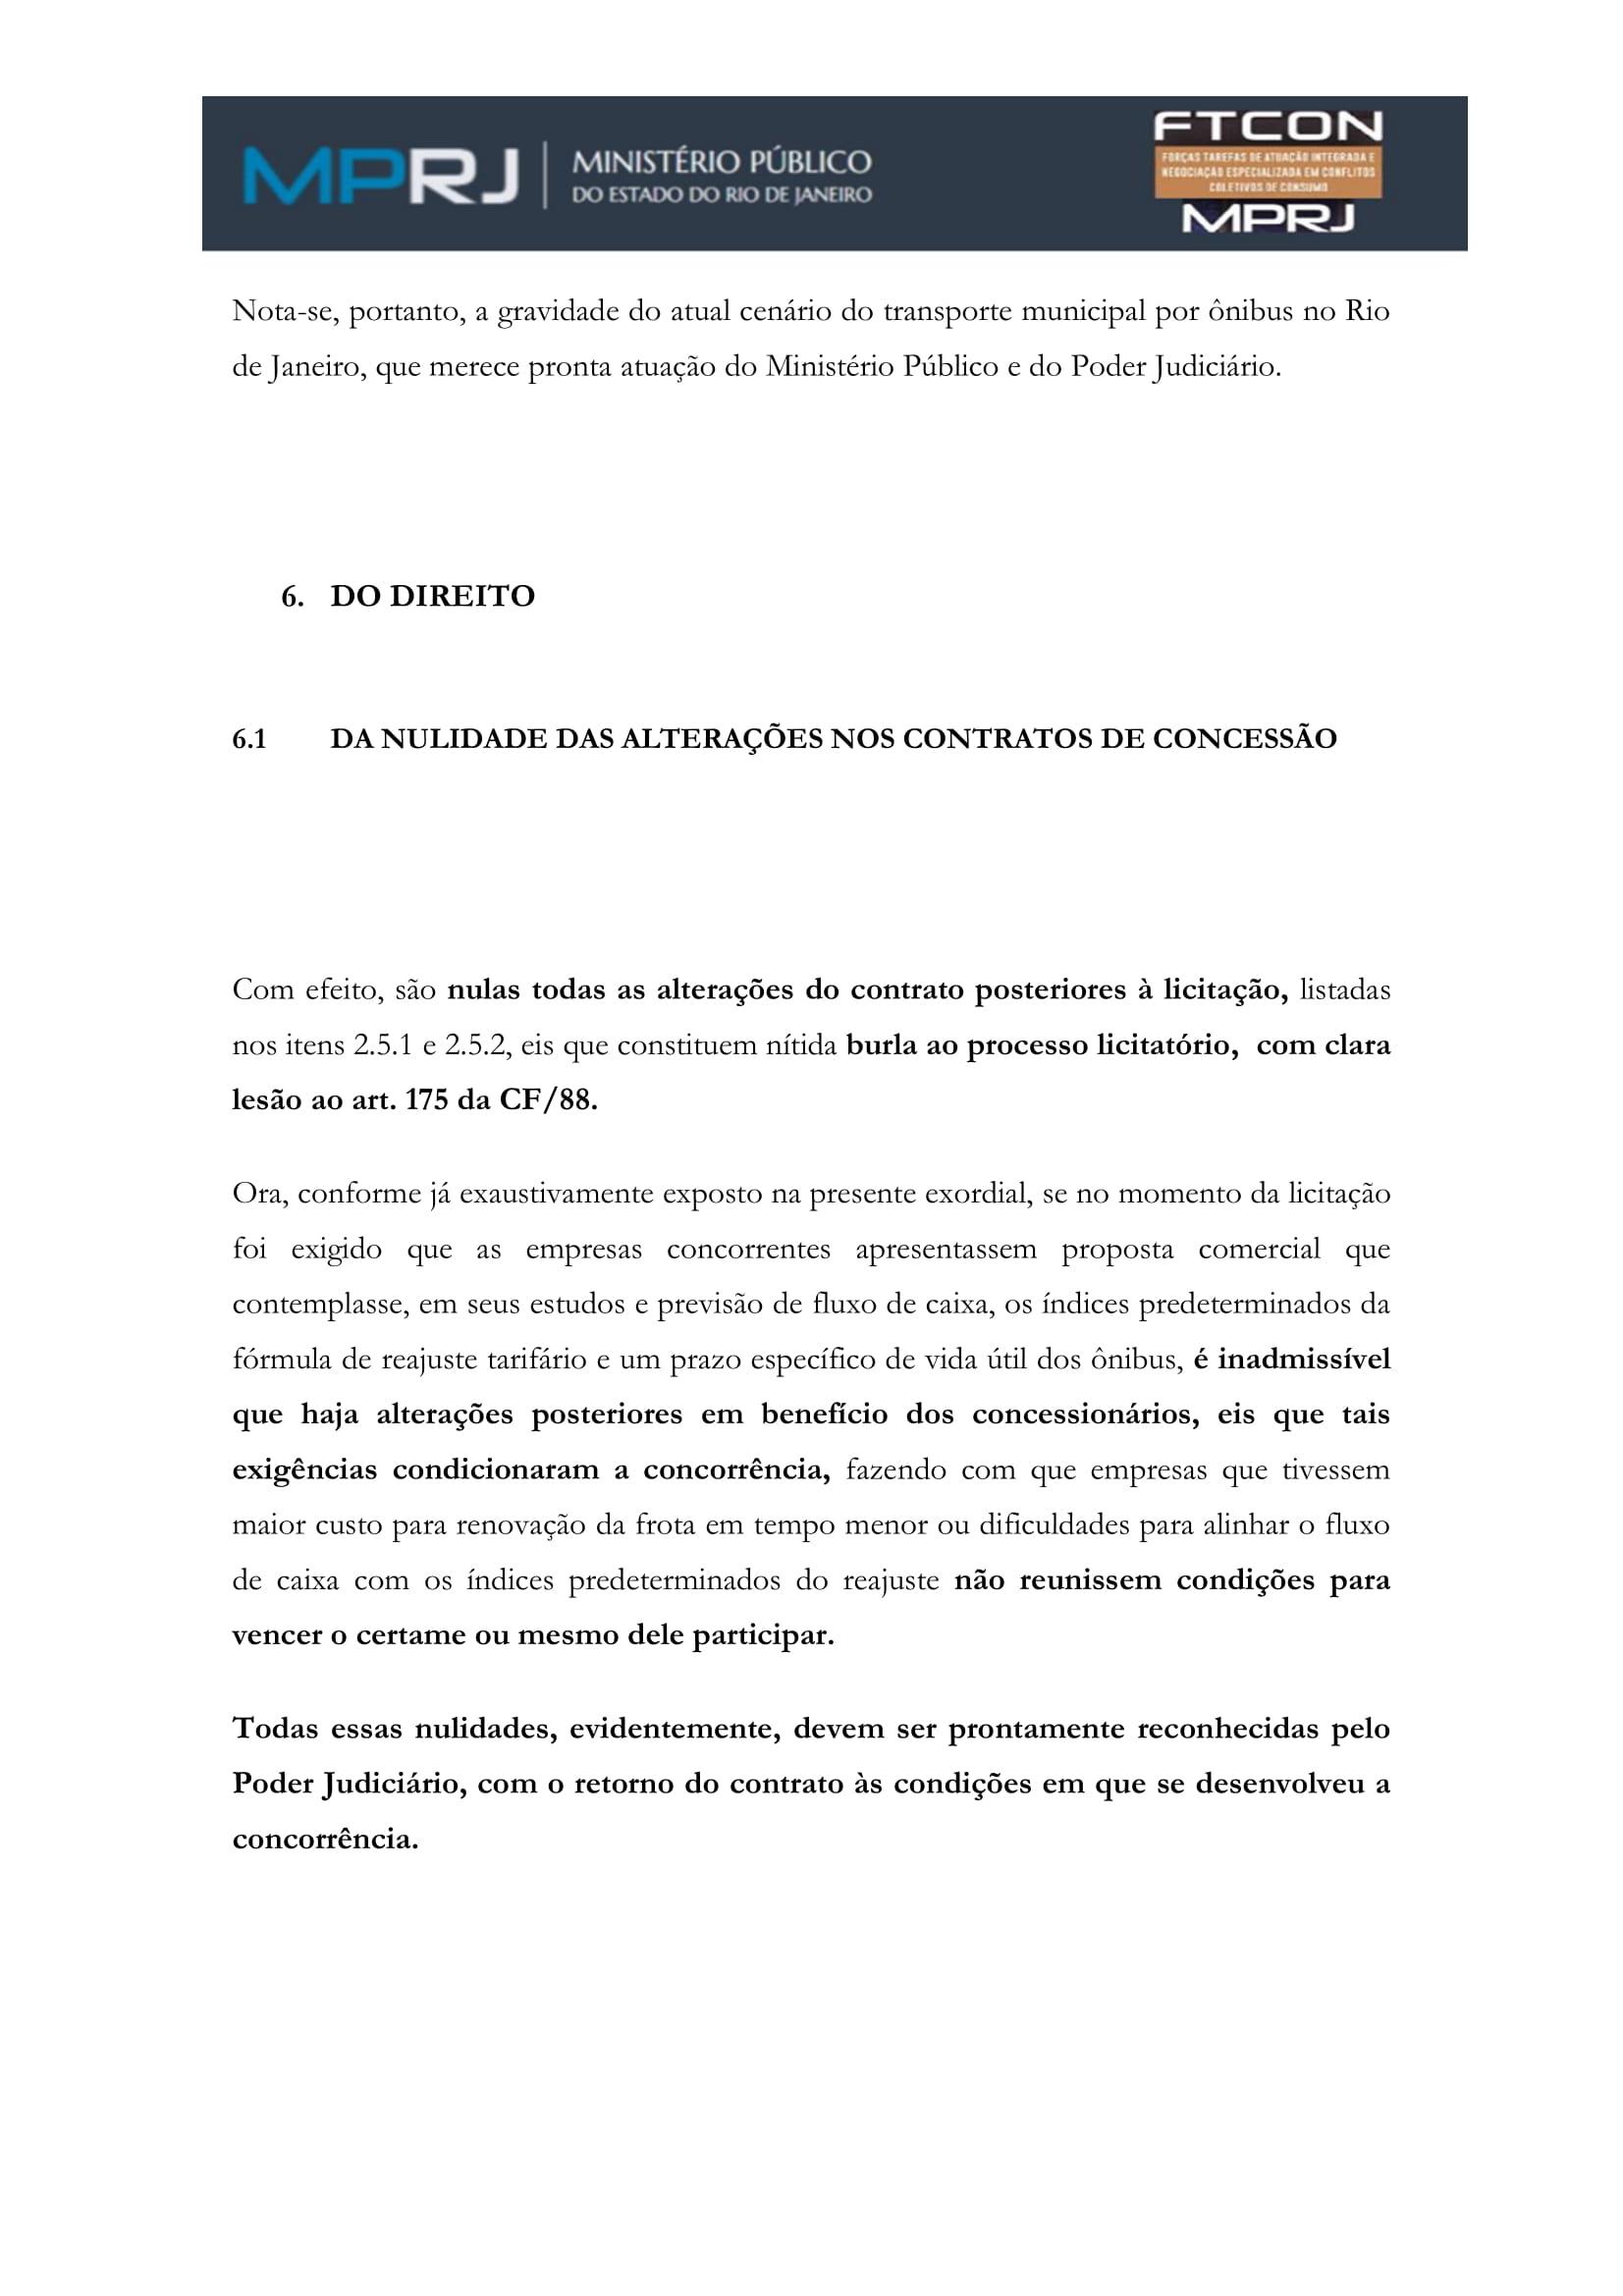 acp_caducidade_onibus_dr_rt-120